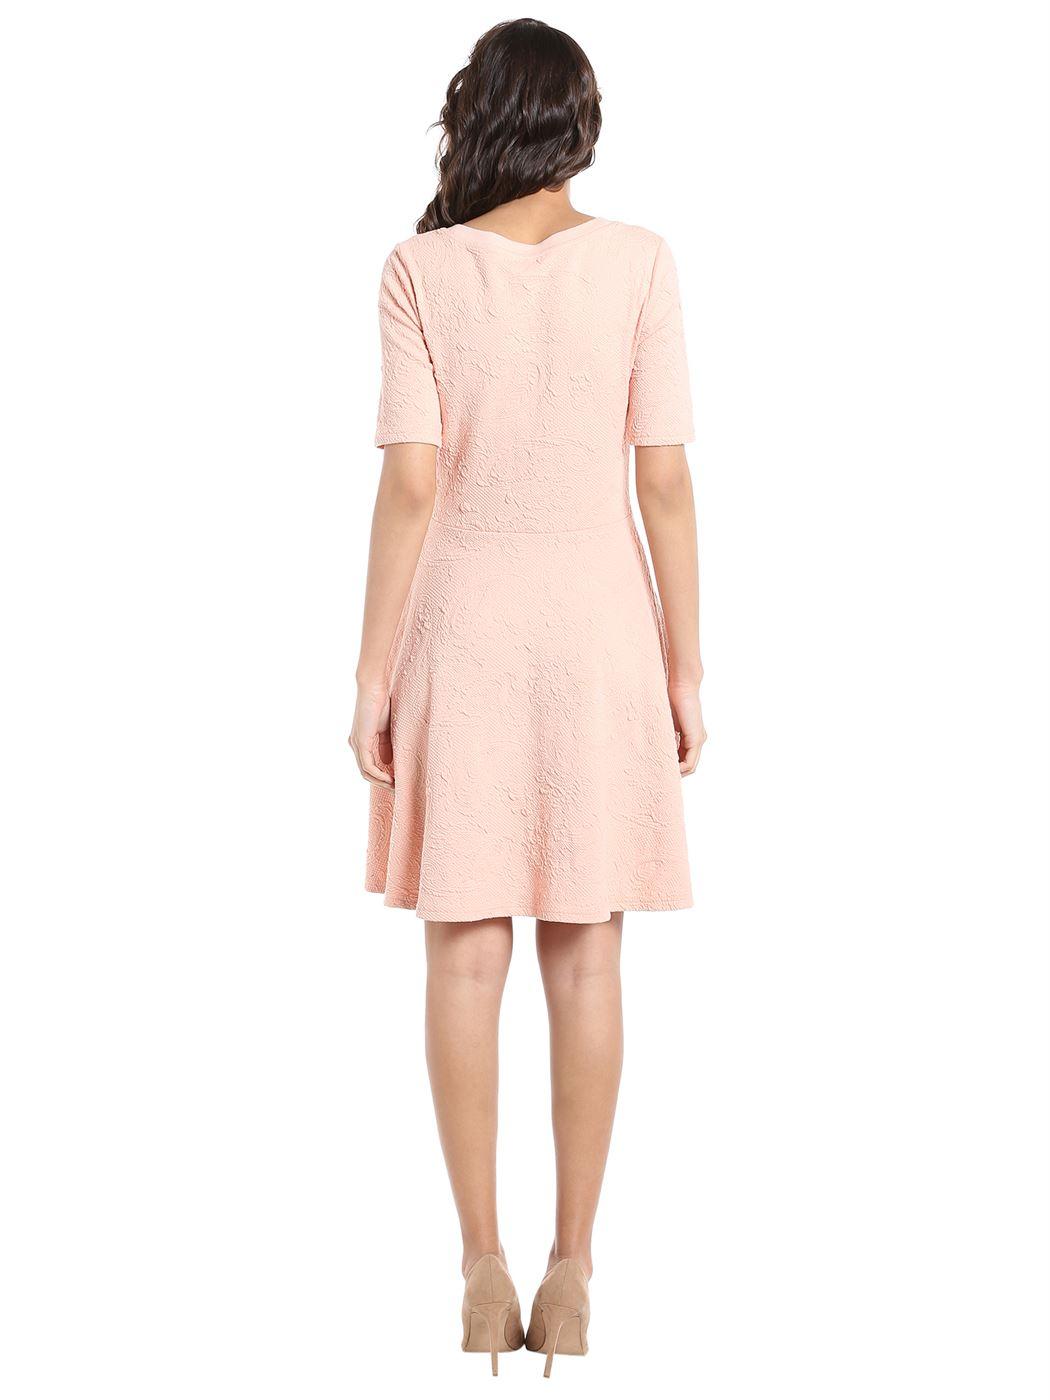 Vero Moda Women's Half Sleeve Pink Dress